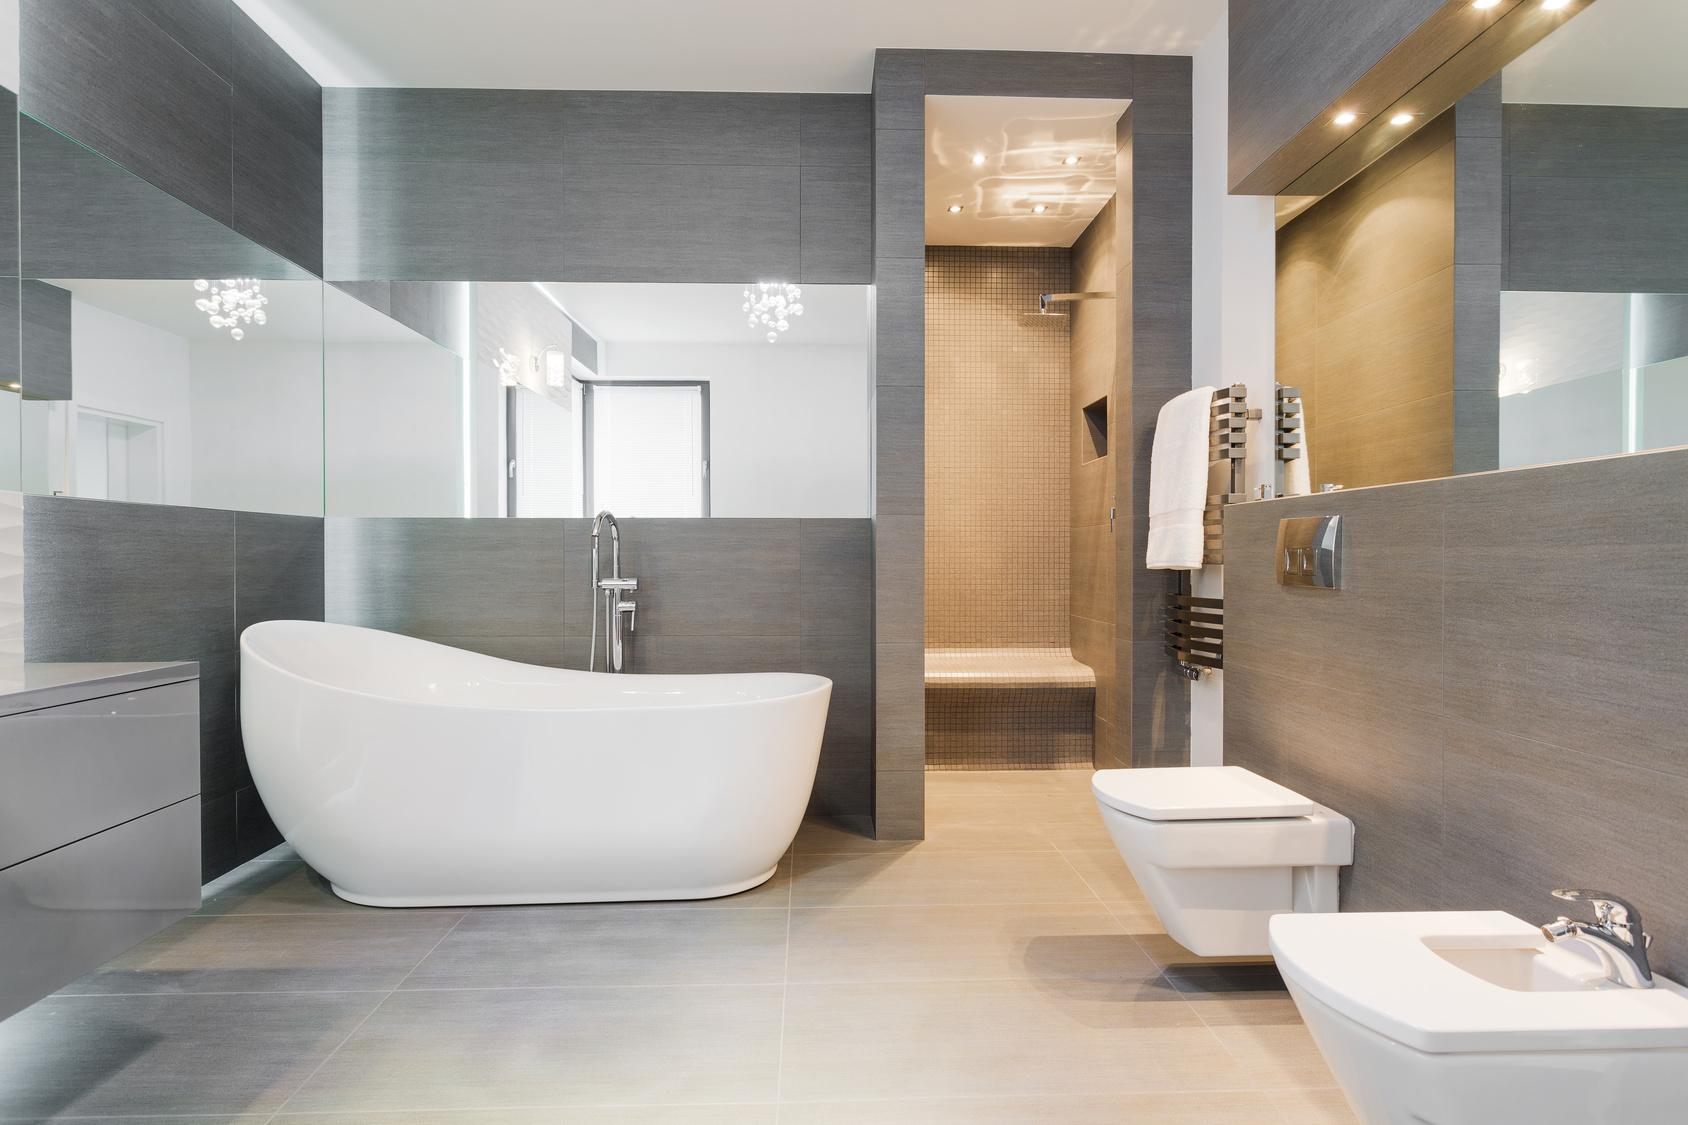 Bathroom remodel in Lebanon, PA,from Weaver's Carpet & Tile